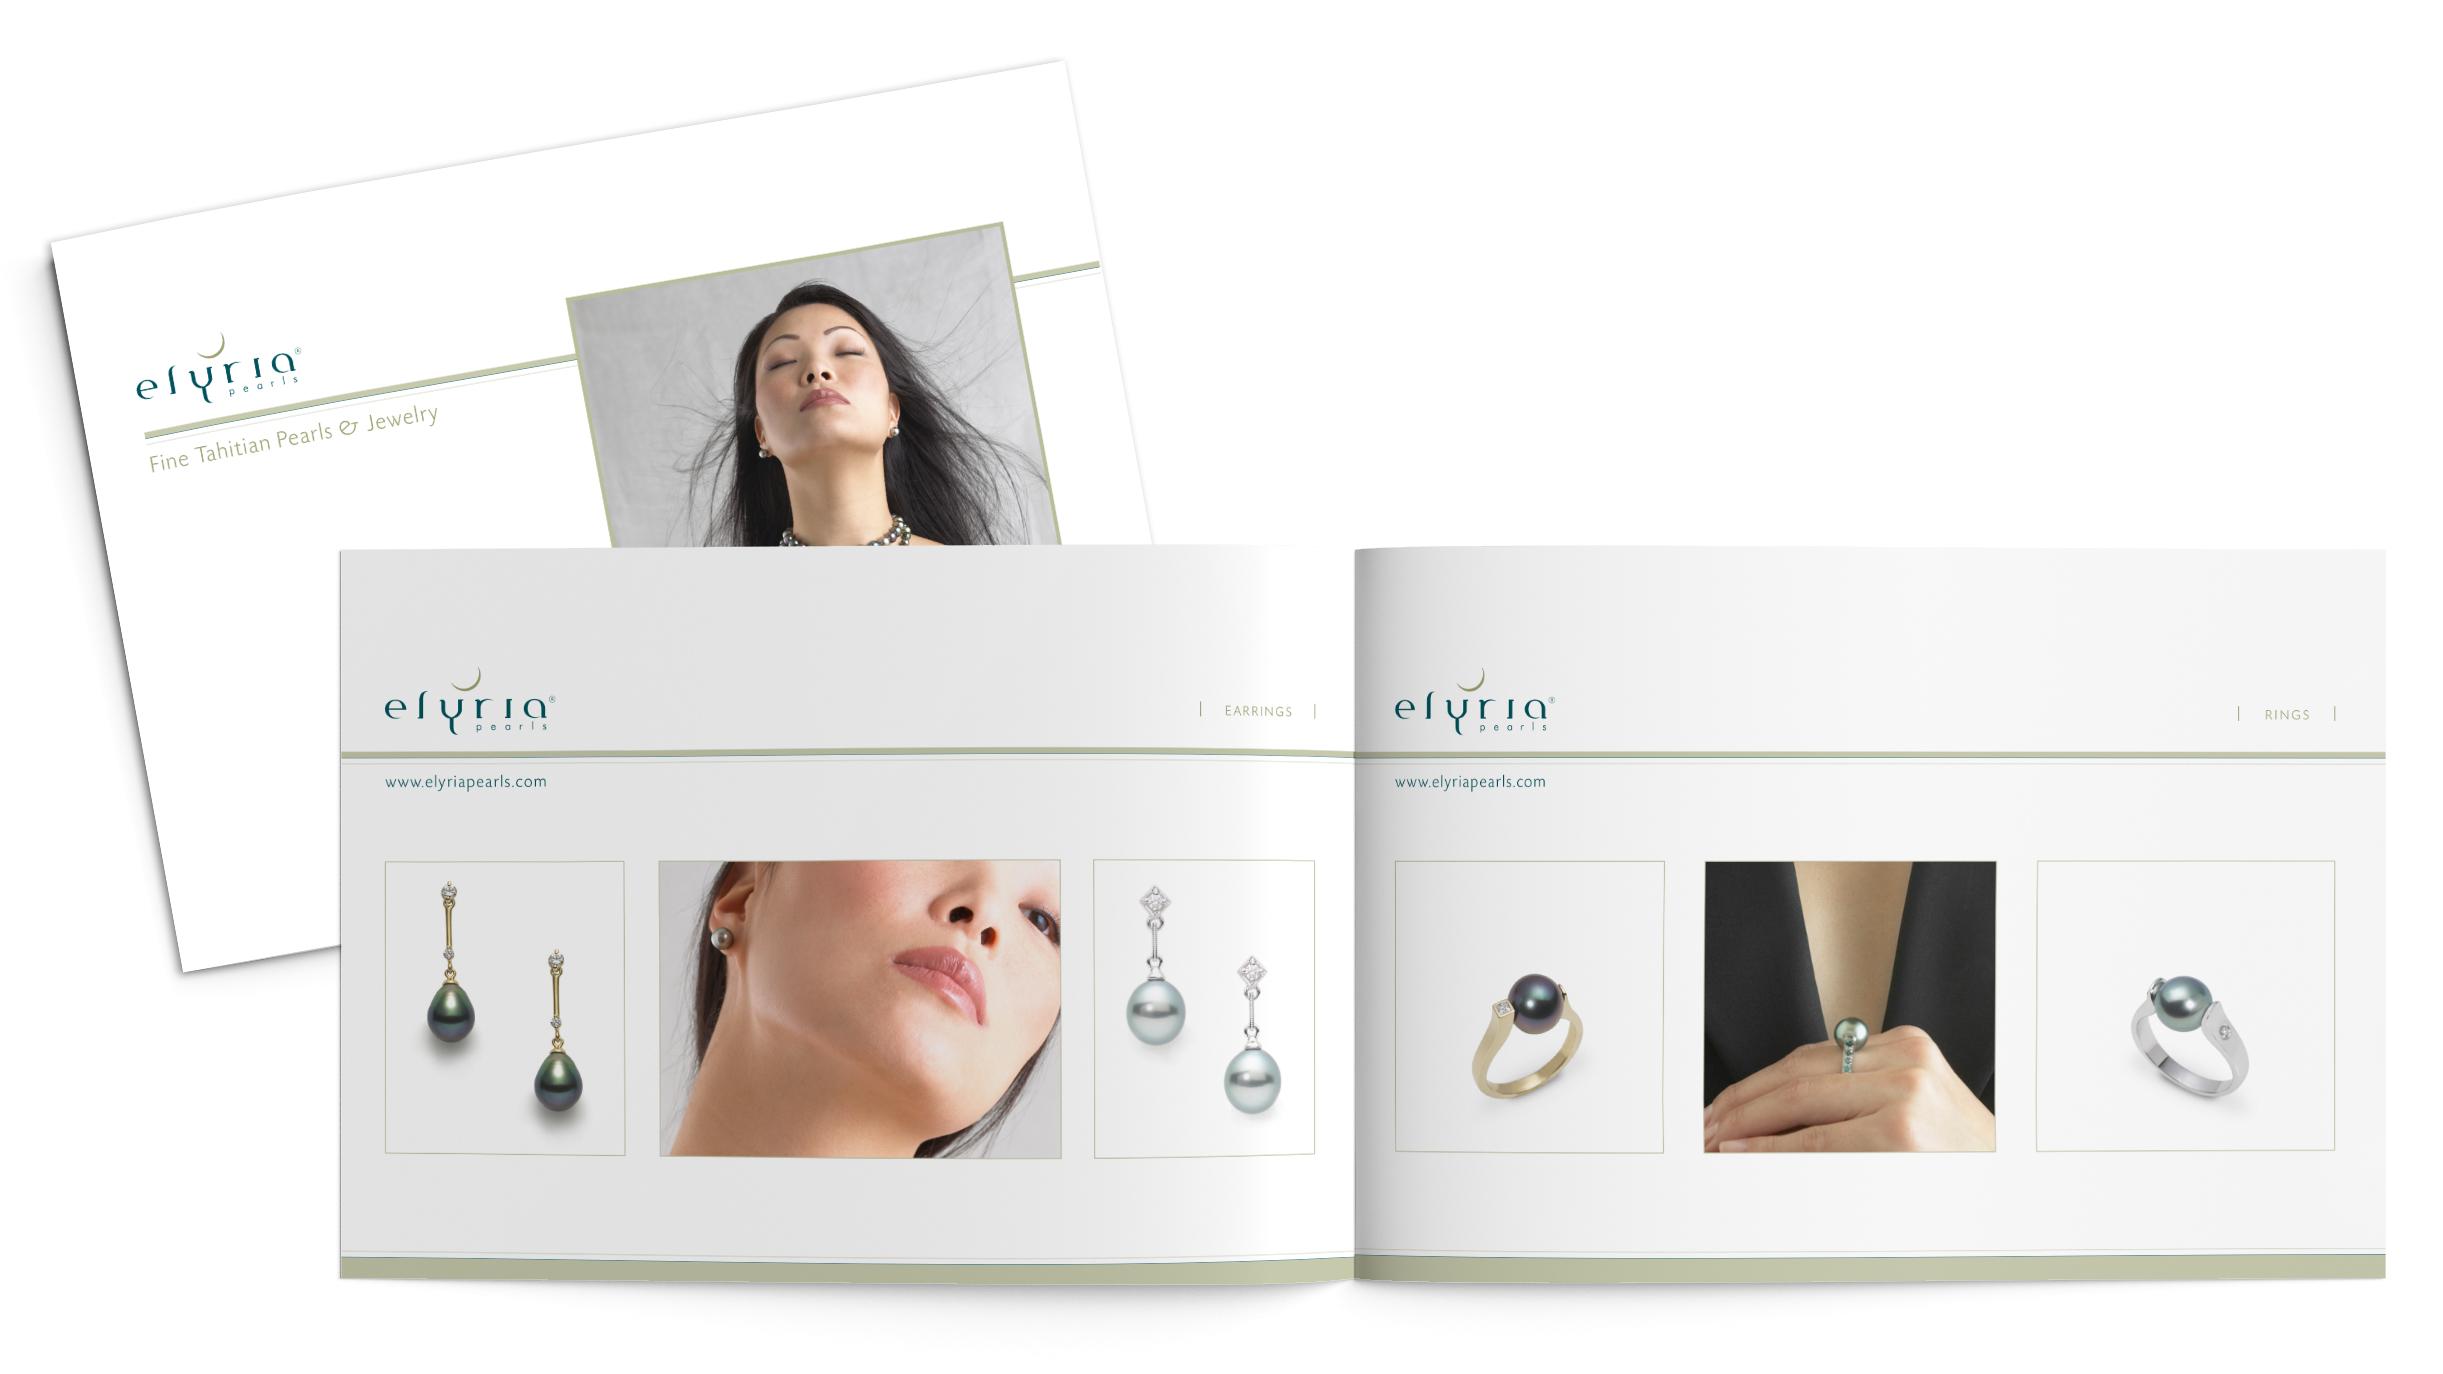 Elyria Pearls Press Kit